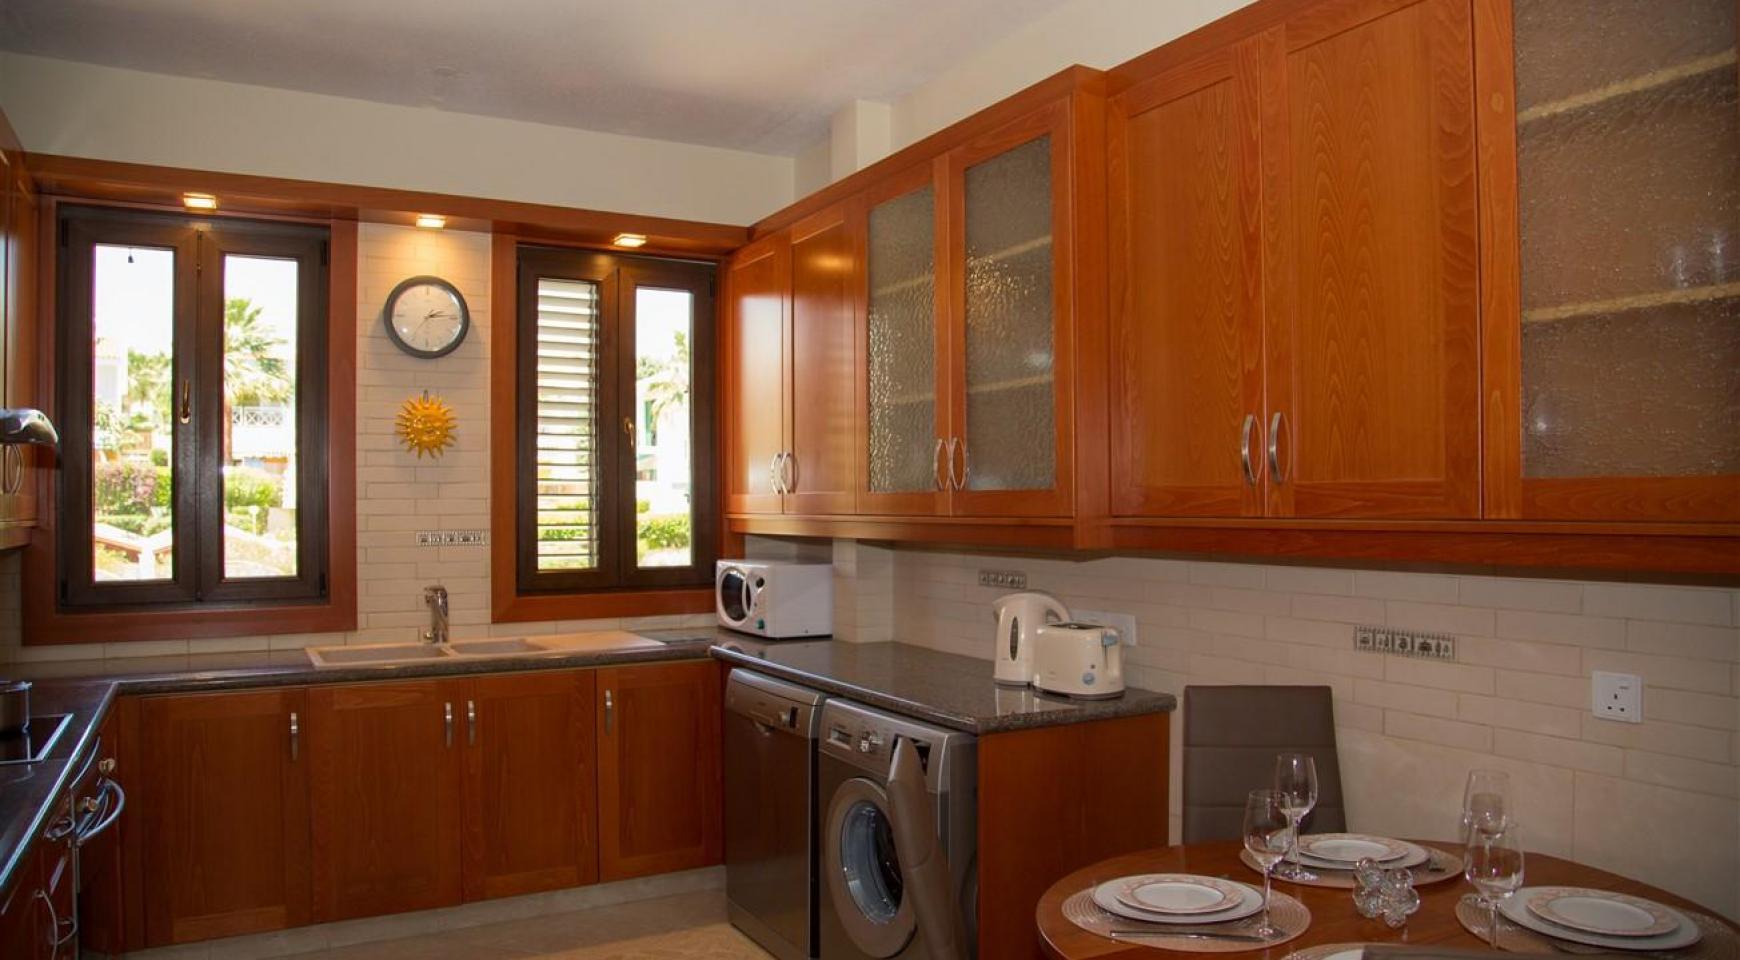 3-Спальная Квартира на Берегу Моря в Комплексе Thera   - 22